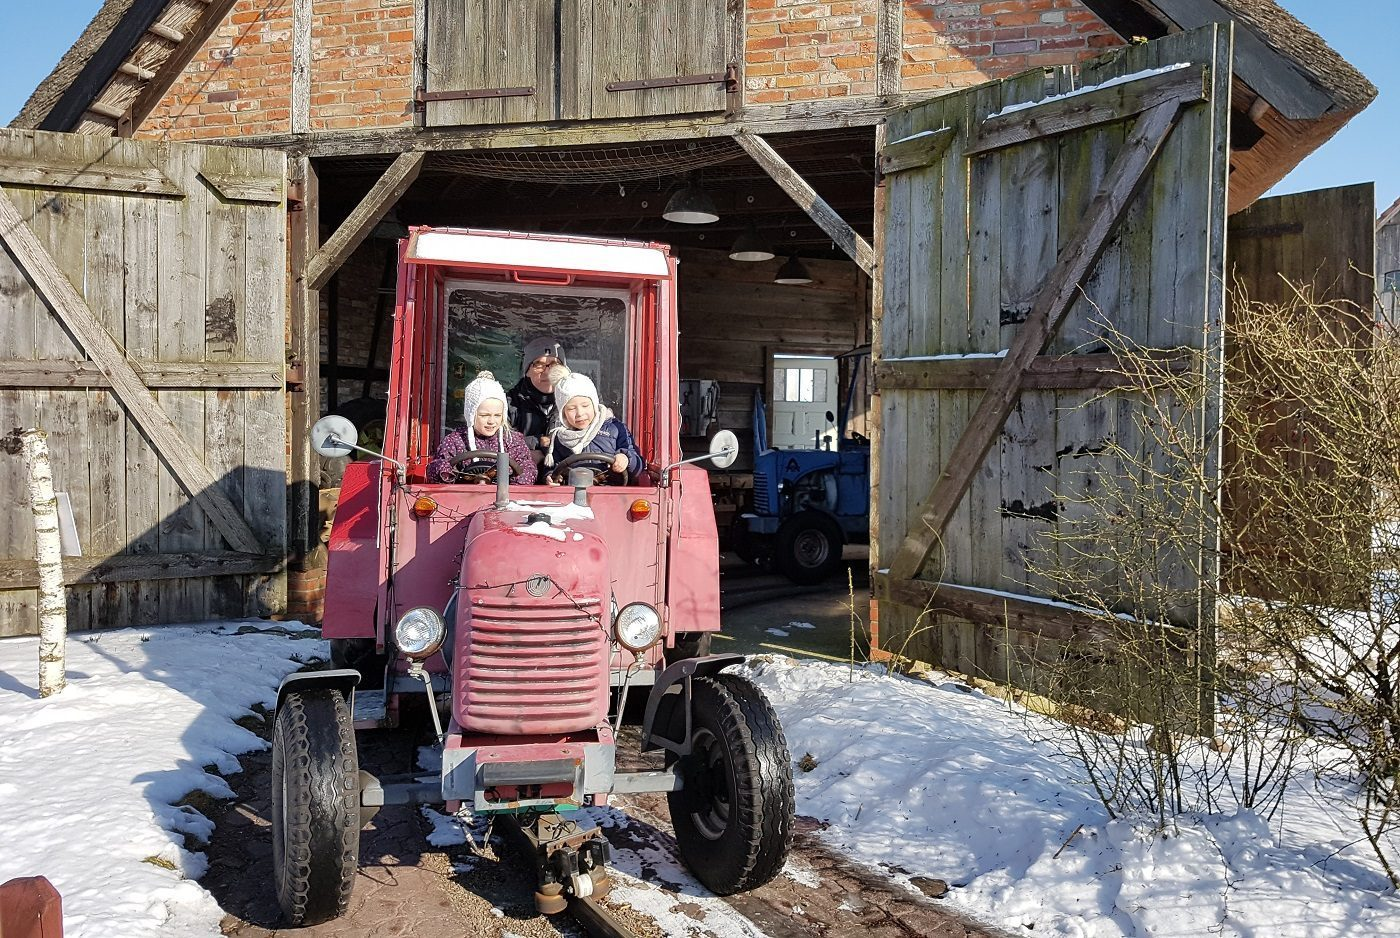 Karls Erlebnis-Dorf Traktorfahrt